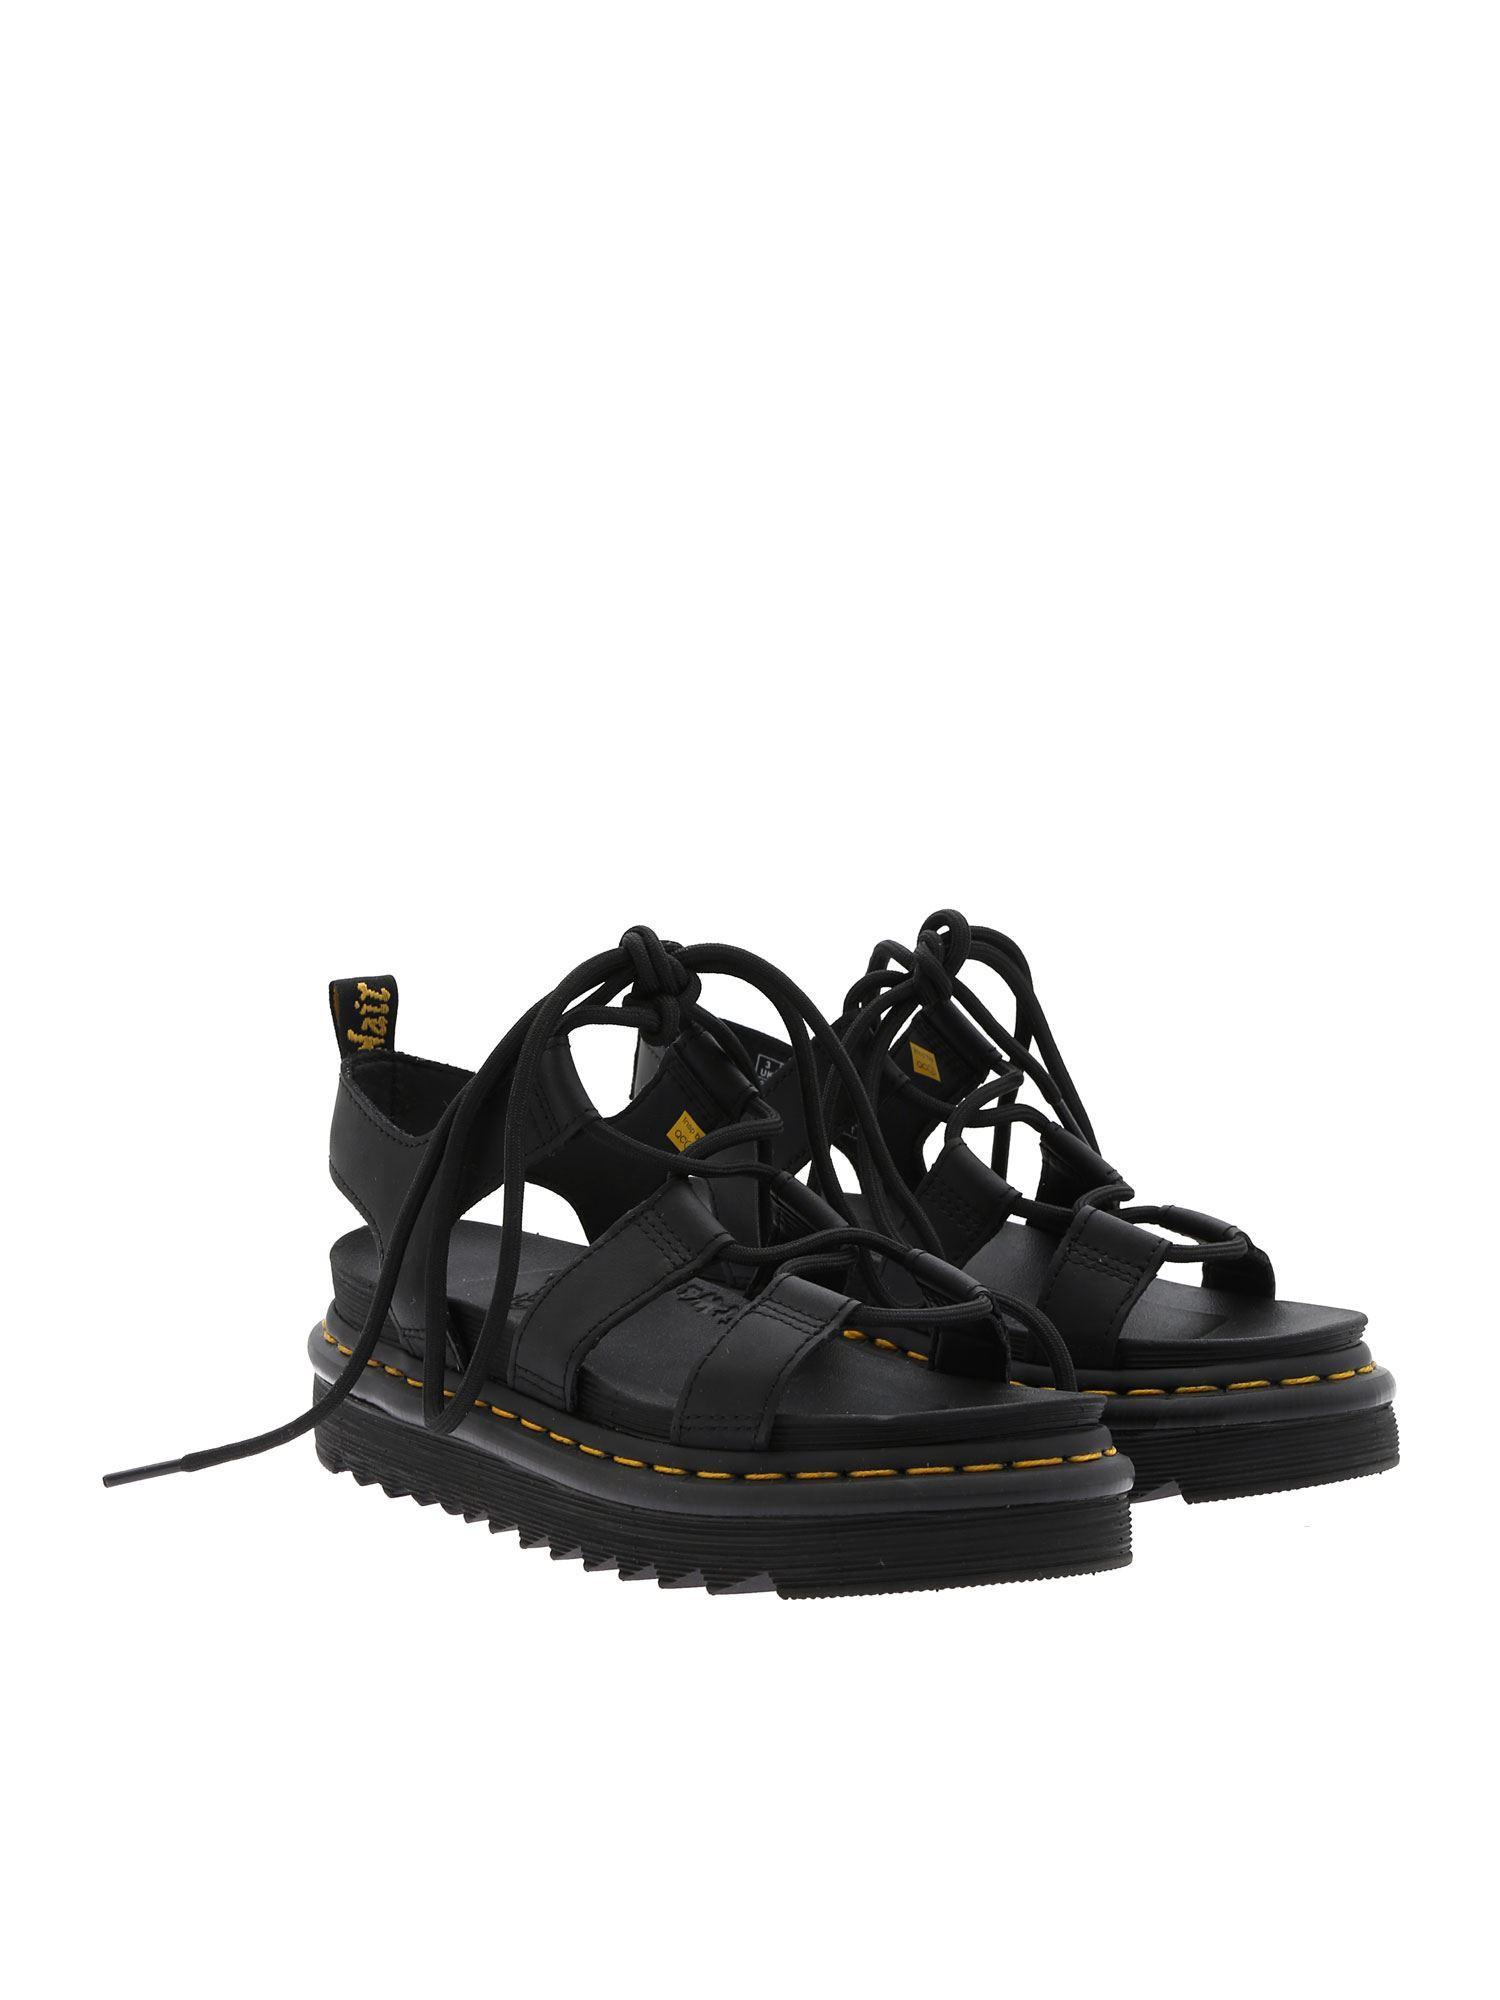 Lyst Black Nartilla Hydro In Fjlctk1 Leather Drmartens Sandals OikuXZP